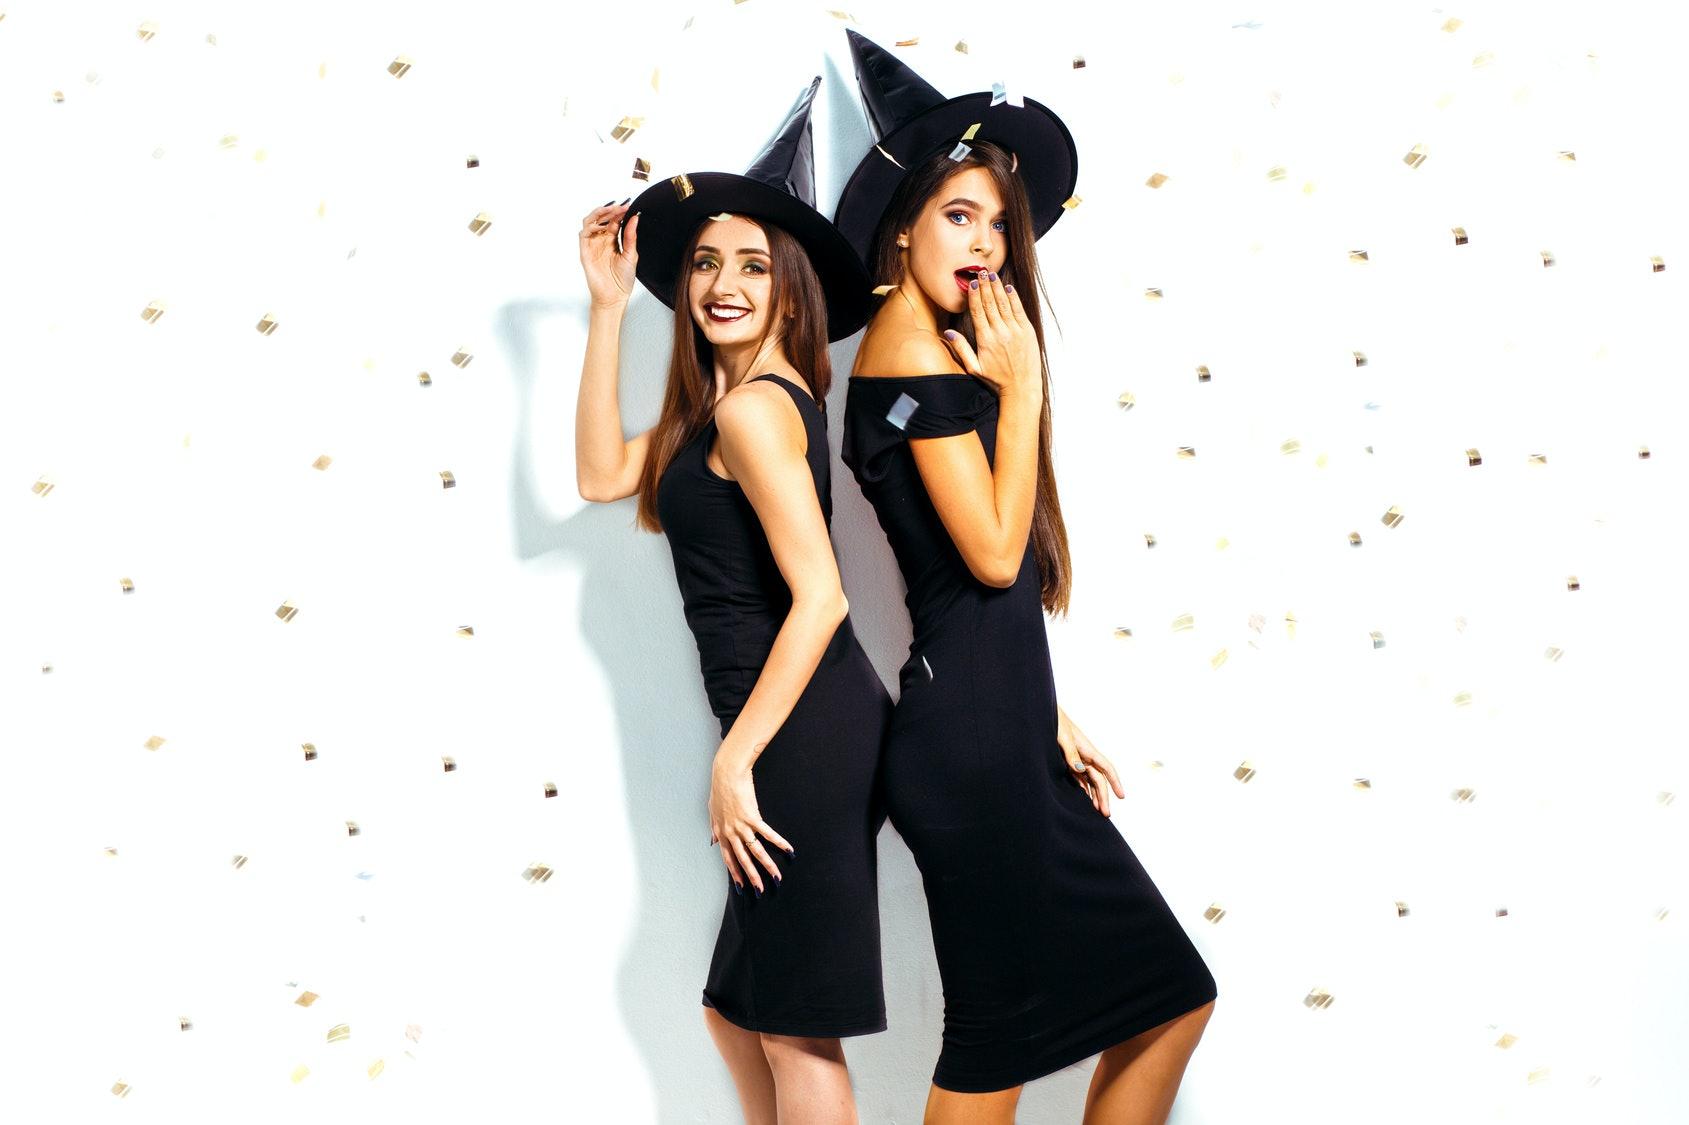 9 little black dress costume ideas that are cute & creative